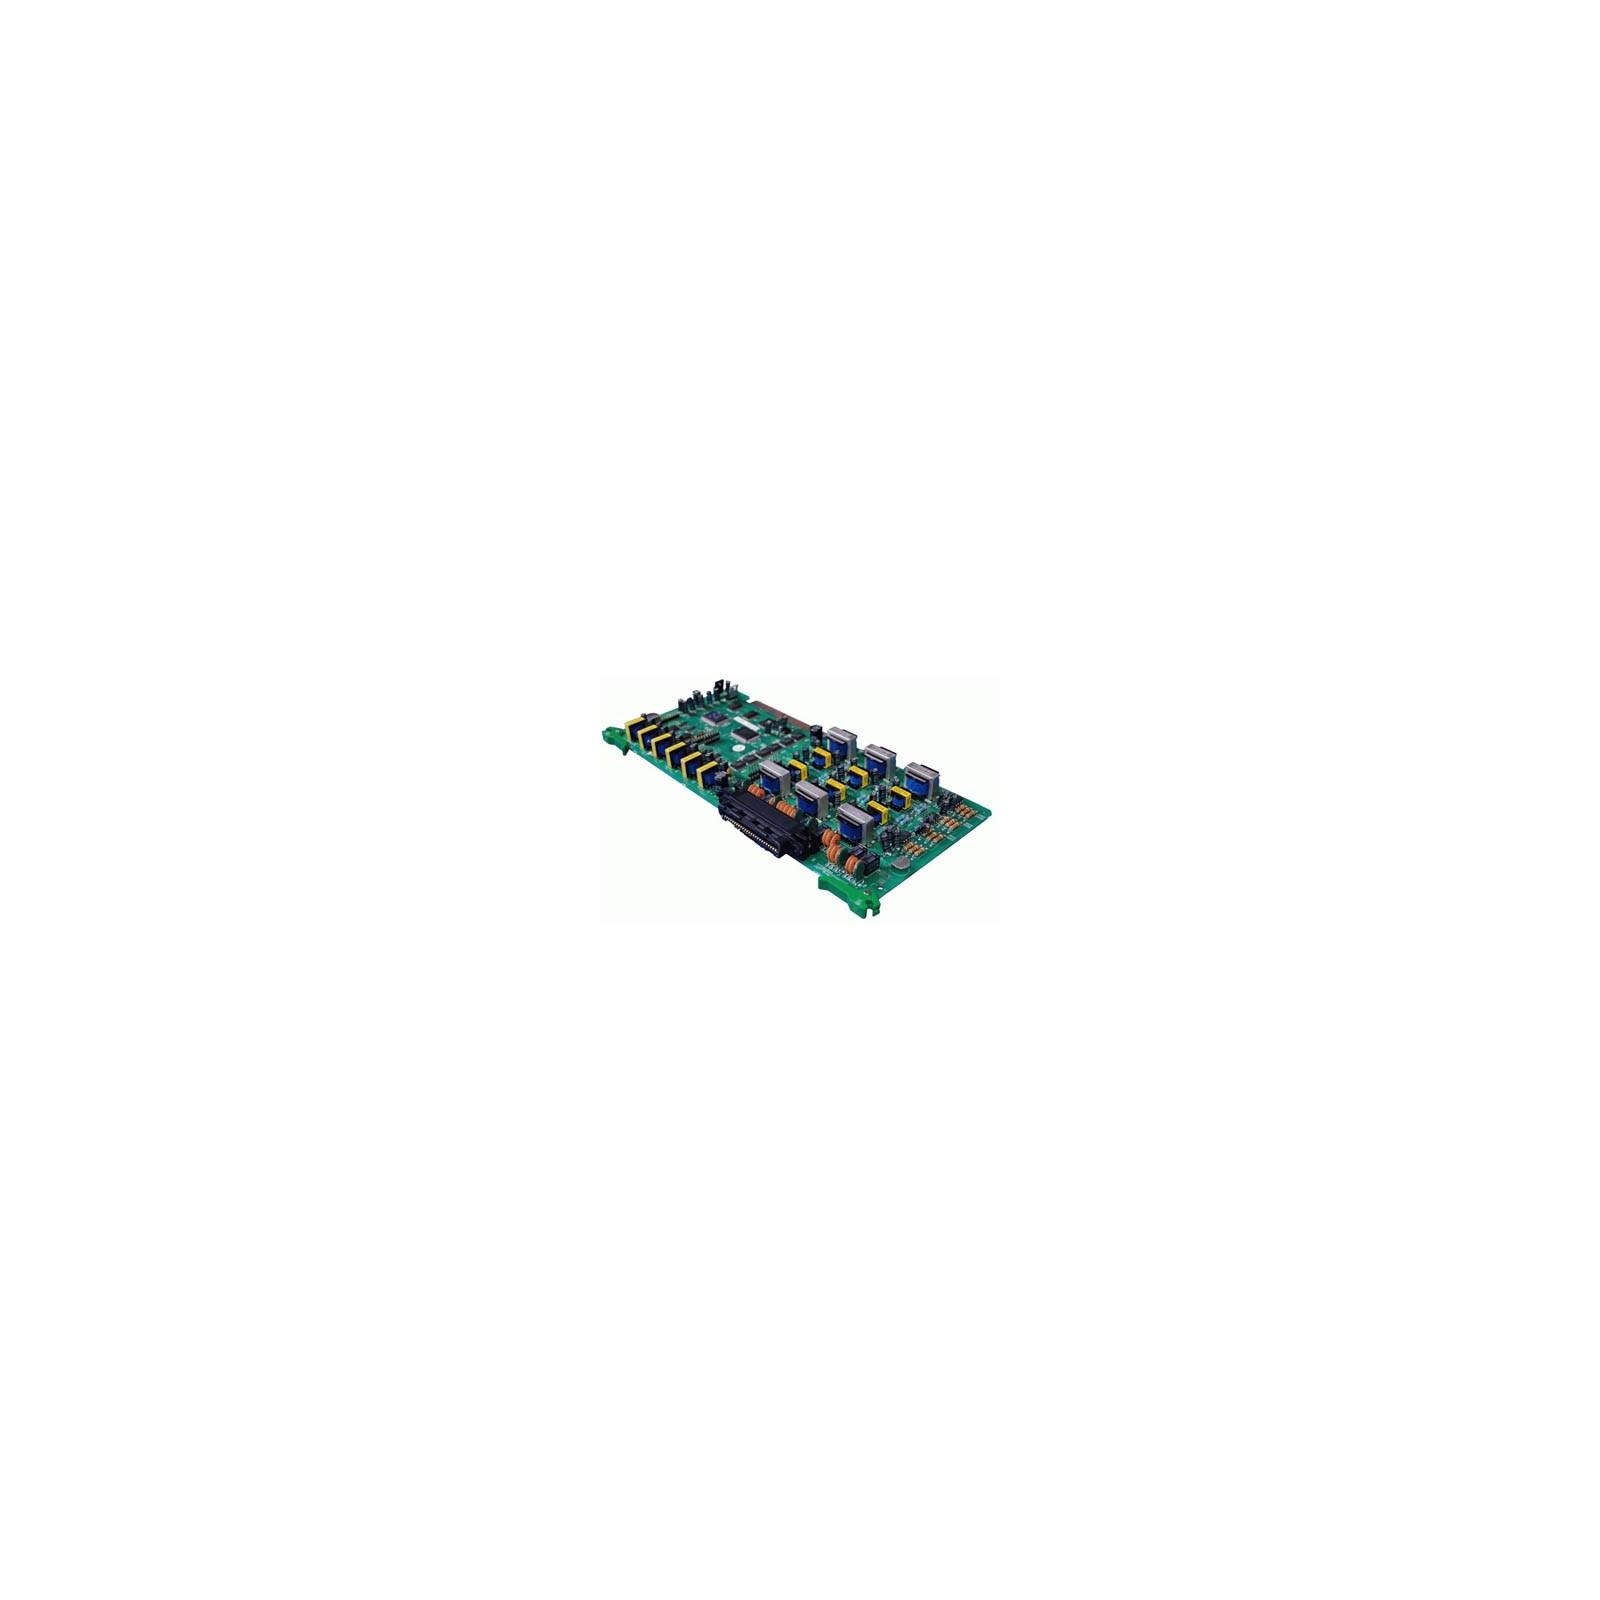 Оборудование для АТС LG D100-DSIB